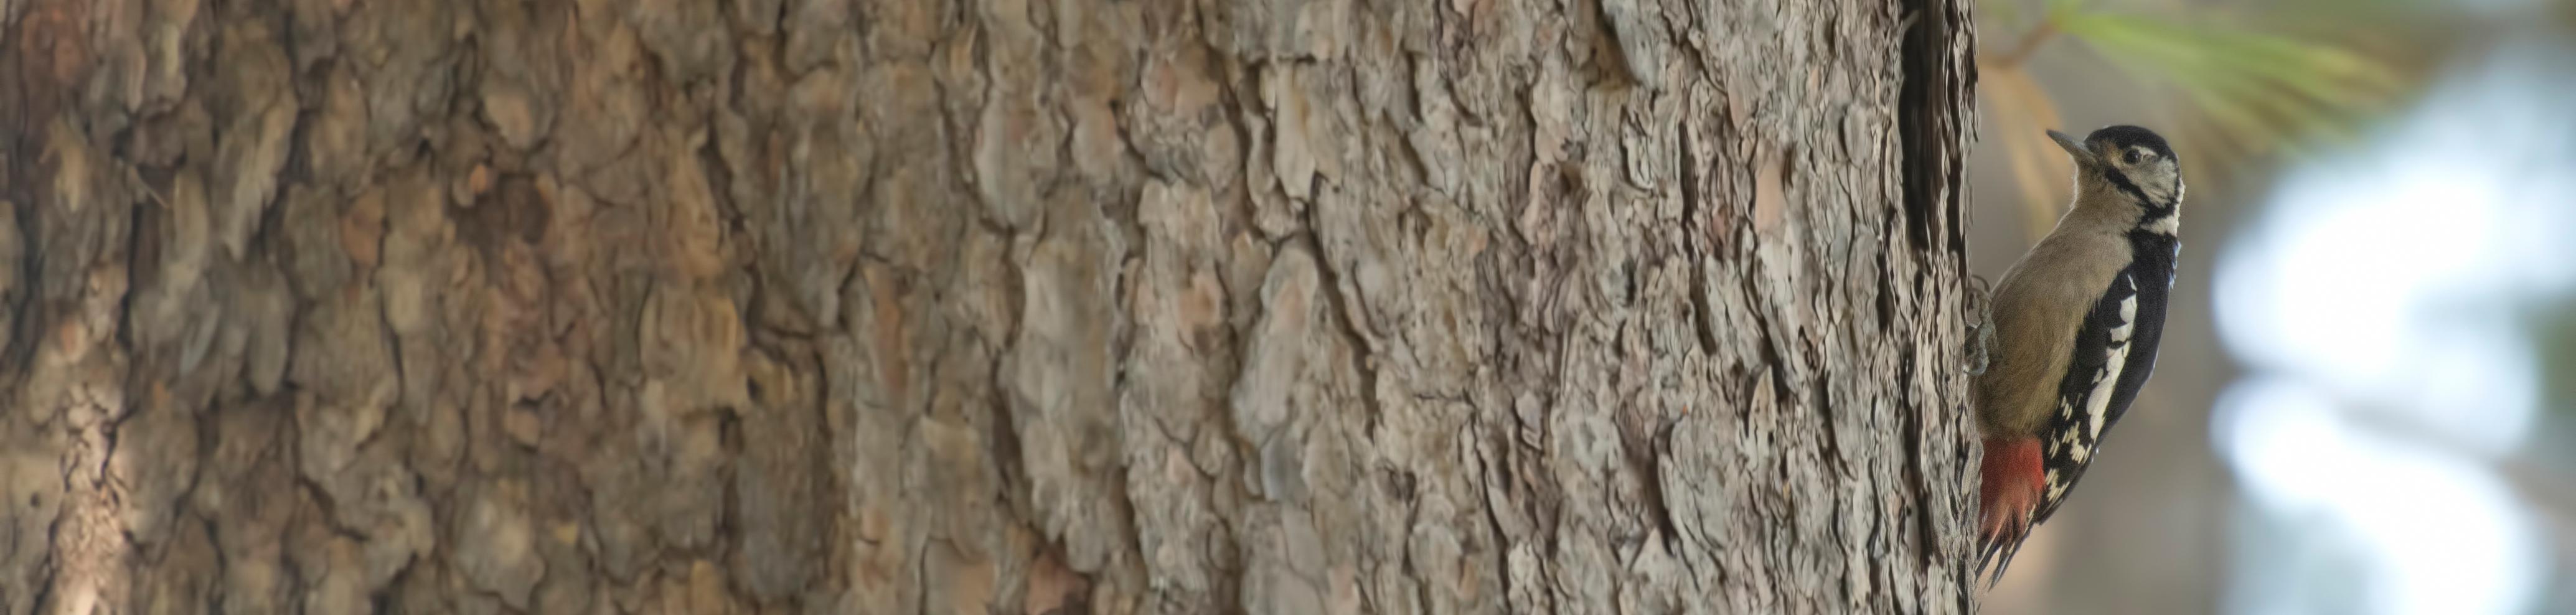 Woodpecker on pine tree 2